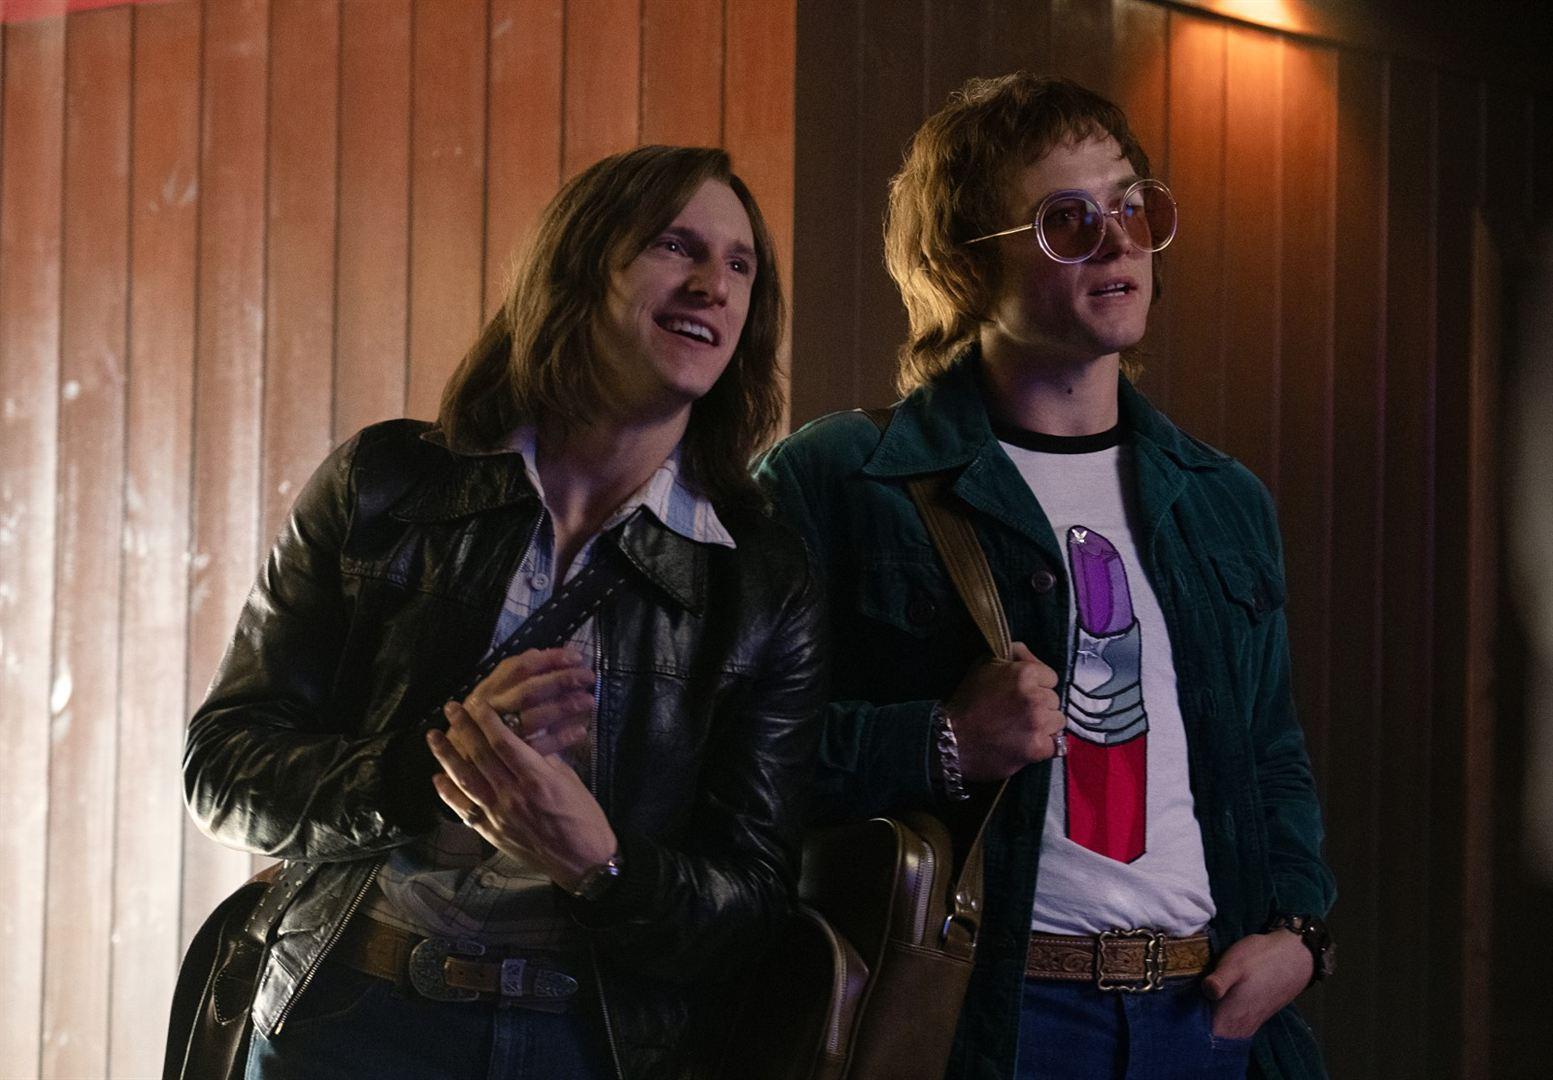 Rocketman - Photo Jamie Bell, Taron Egerton critique avis film cannes 2019